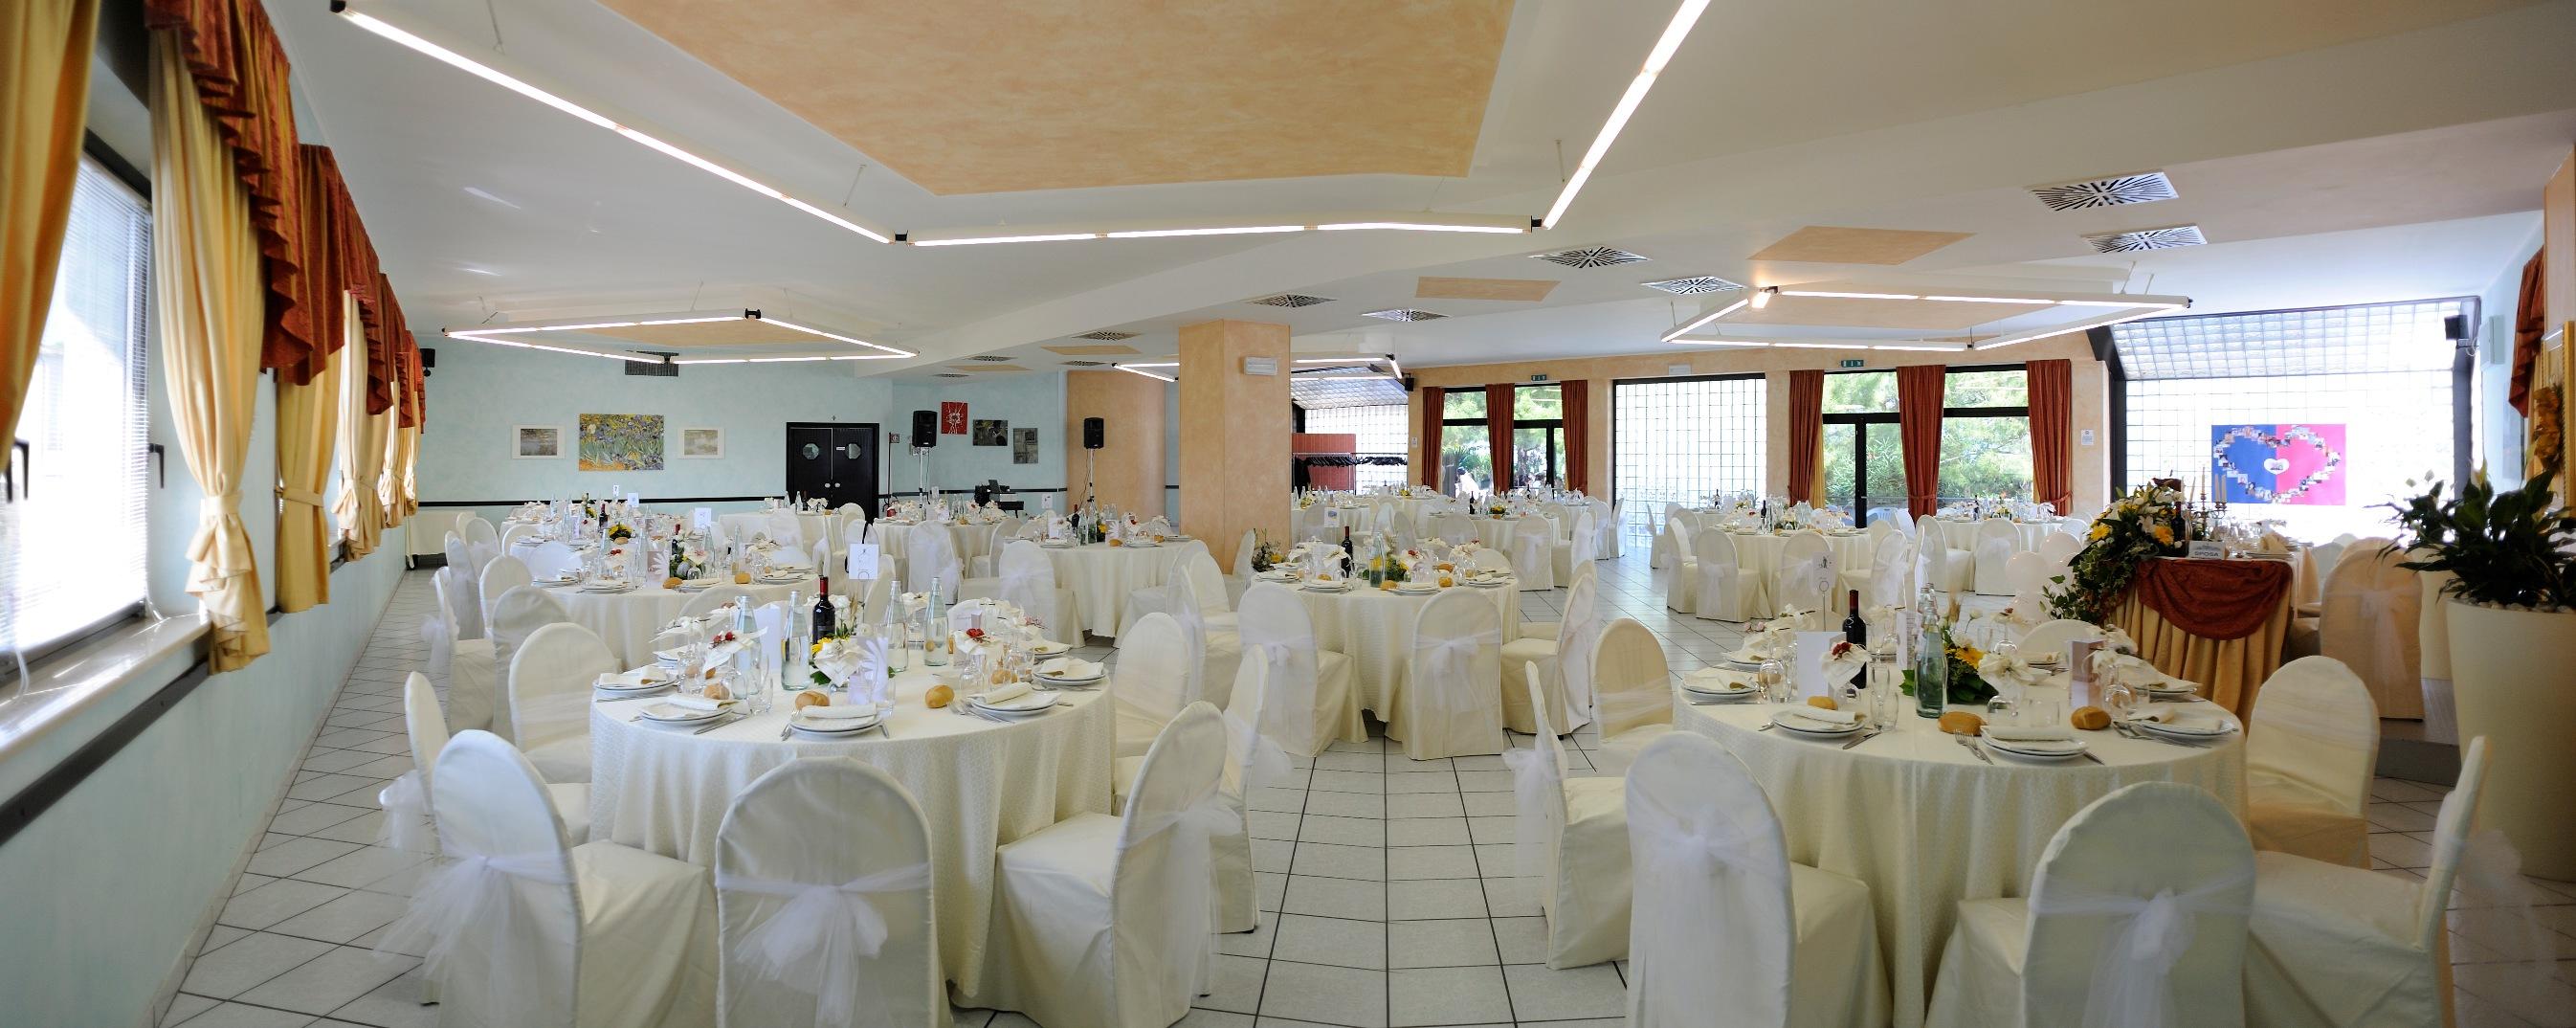 Ristorante villa d 39 este santa maria nuova an ristorante tipico marchigiano cucina creativa - Cucina villa d este ...